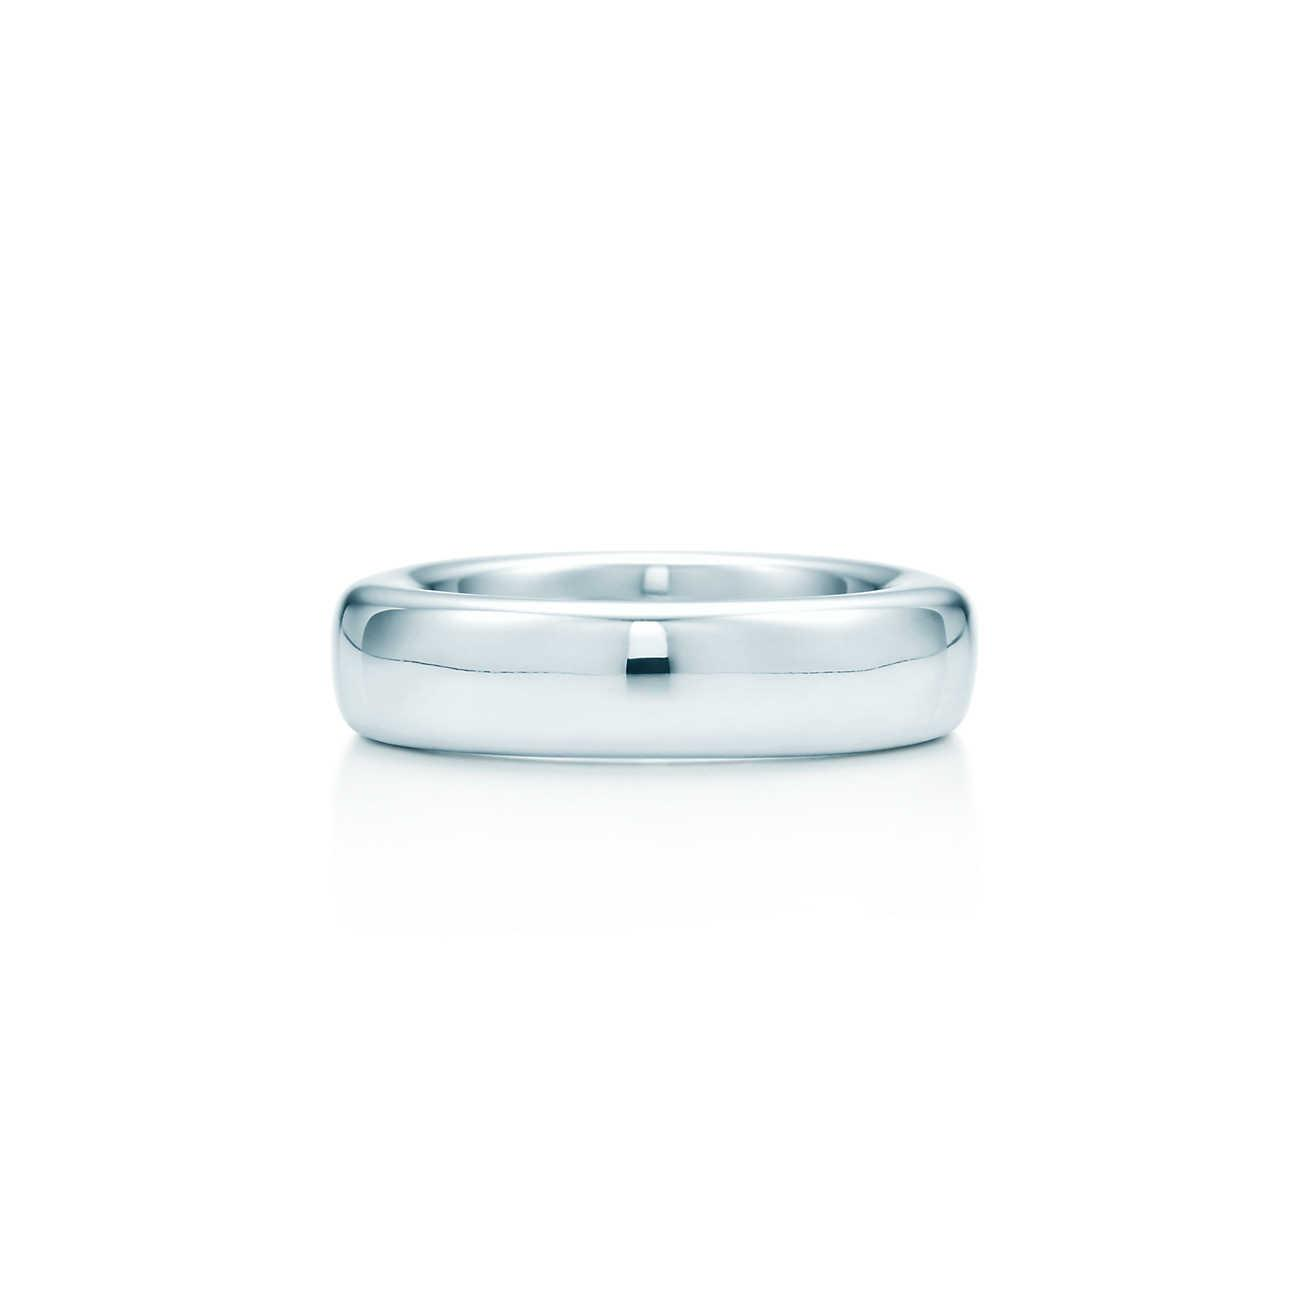 1d74dee0b0a11 Women's Metallic Elsa Peretti. Doughnut Ring In Sterling Silver - 4